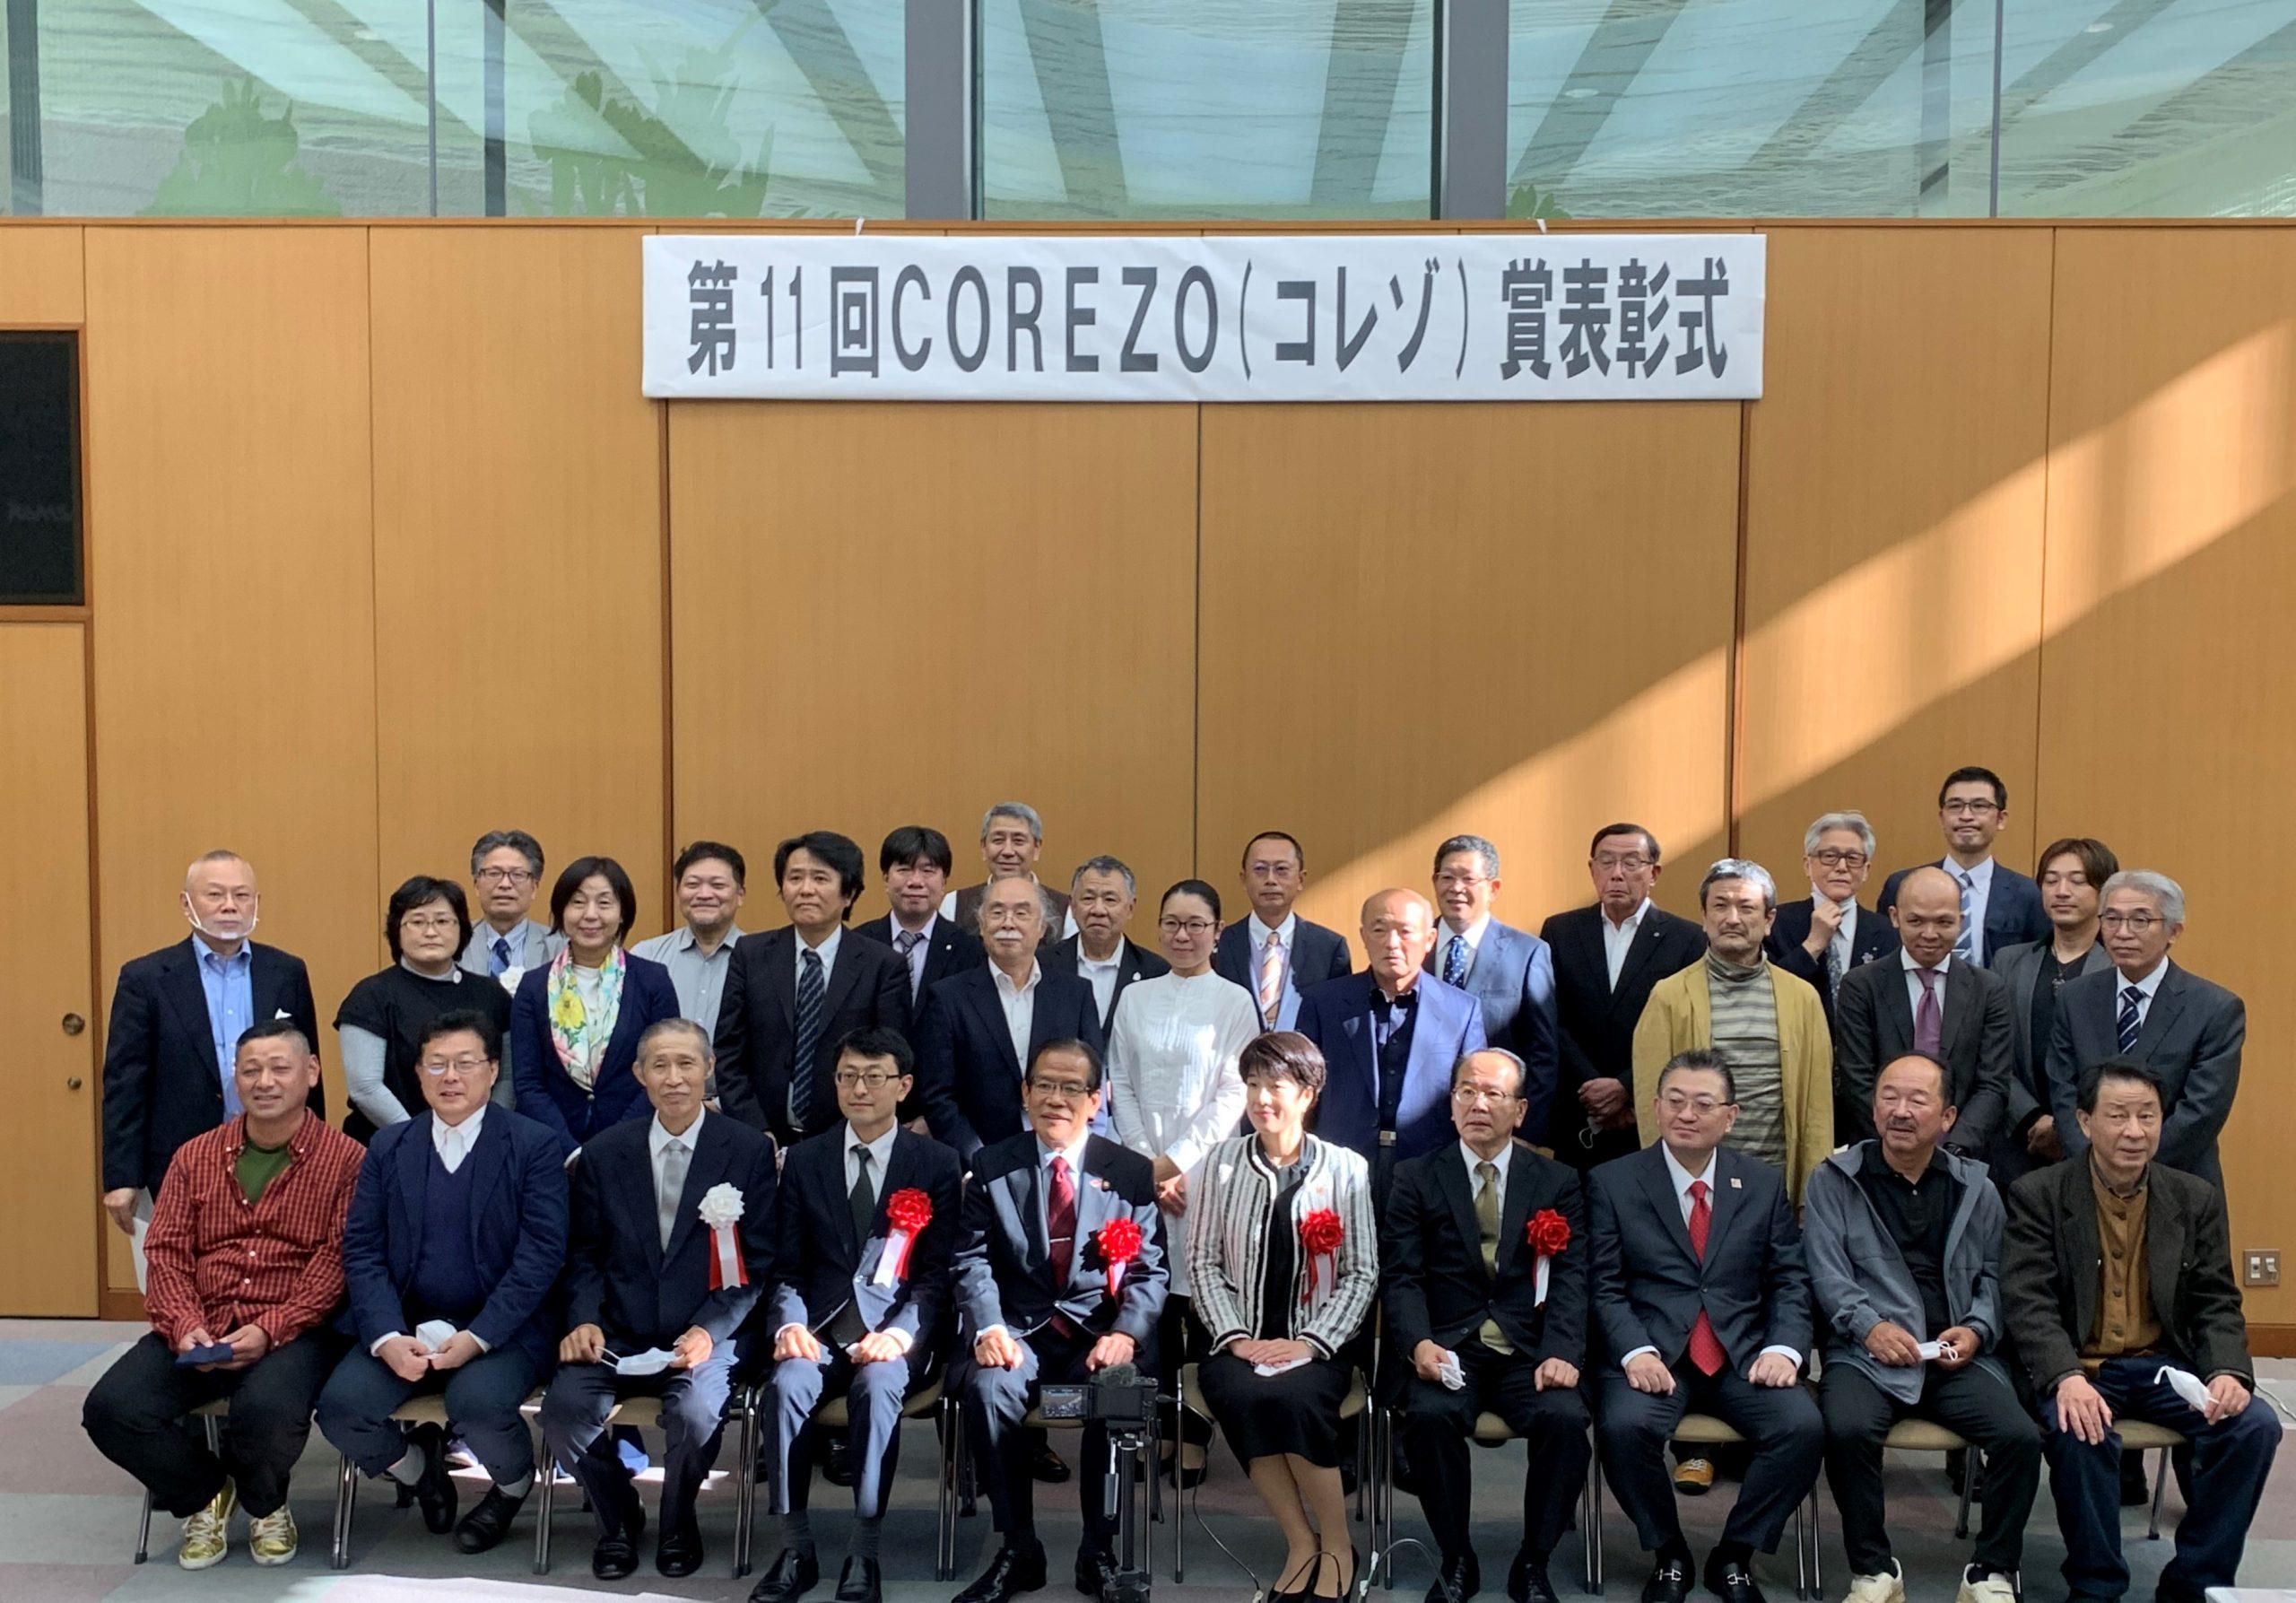 2020COREZO11th表彰式記念撮影